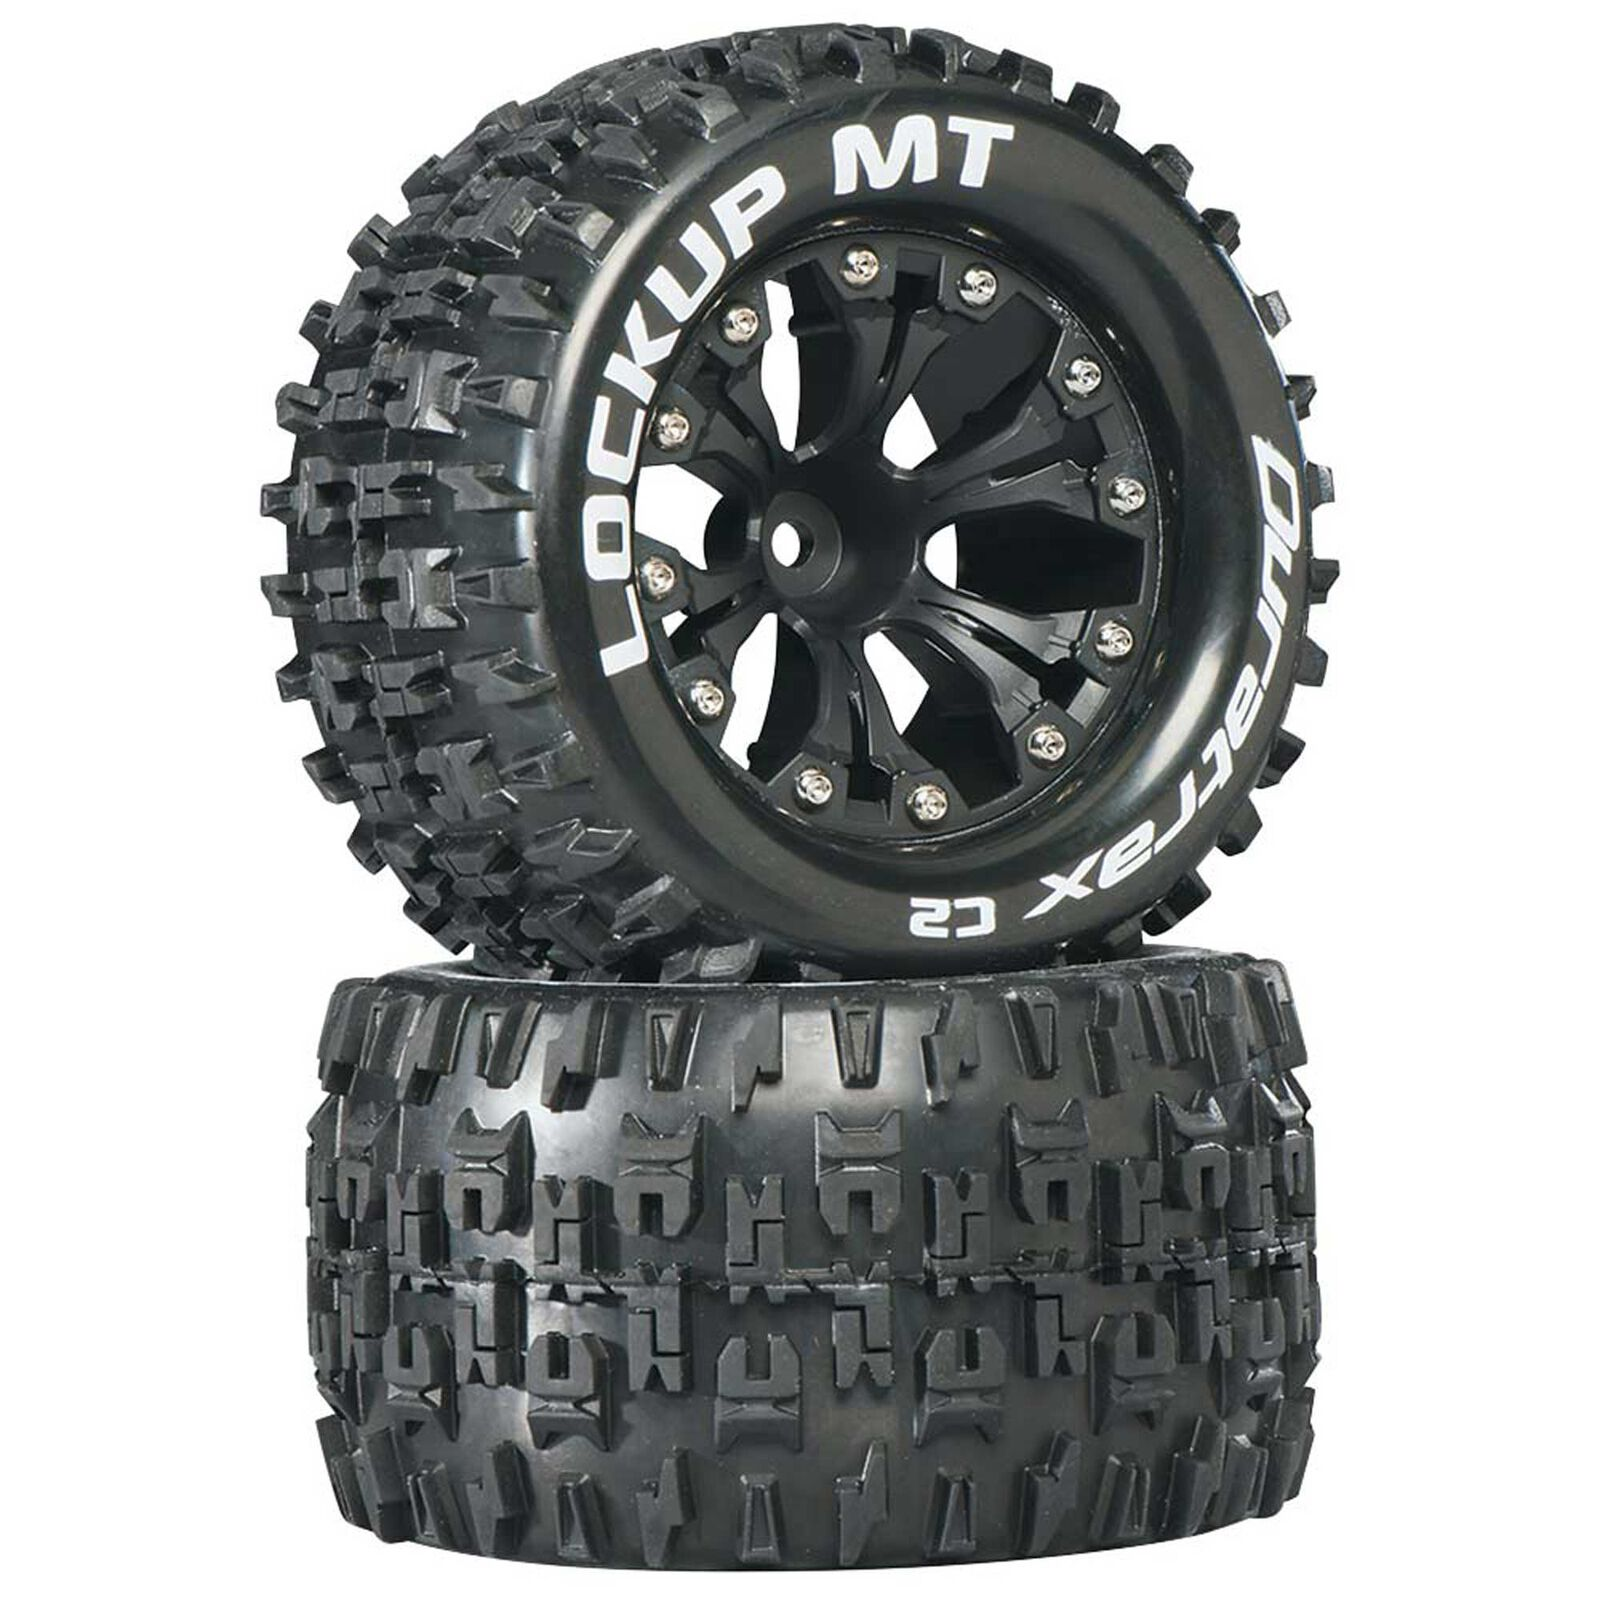 "Lockup MT 2.8"" 2WD Mounted 1/2"" Offset Tires, Black (2)"